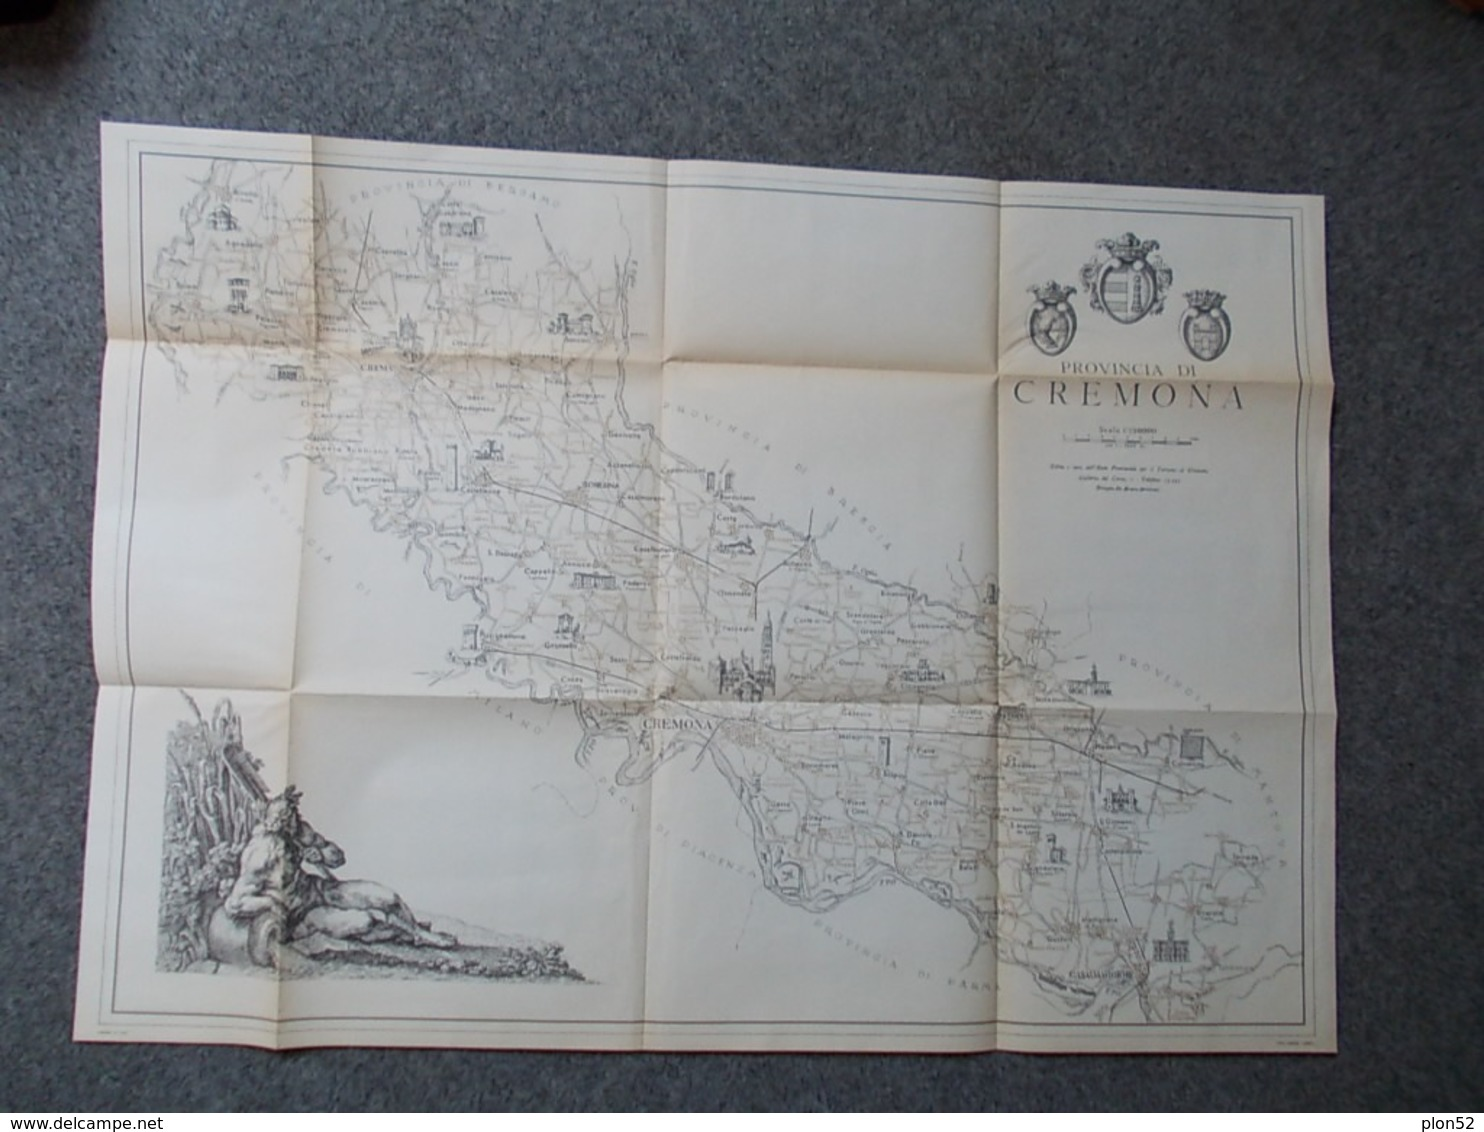 12668-CARTA GEOGRAFICA PROVINCIA DI CREMONA - SCALA 1:150.000 - Carte Geographique